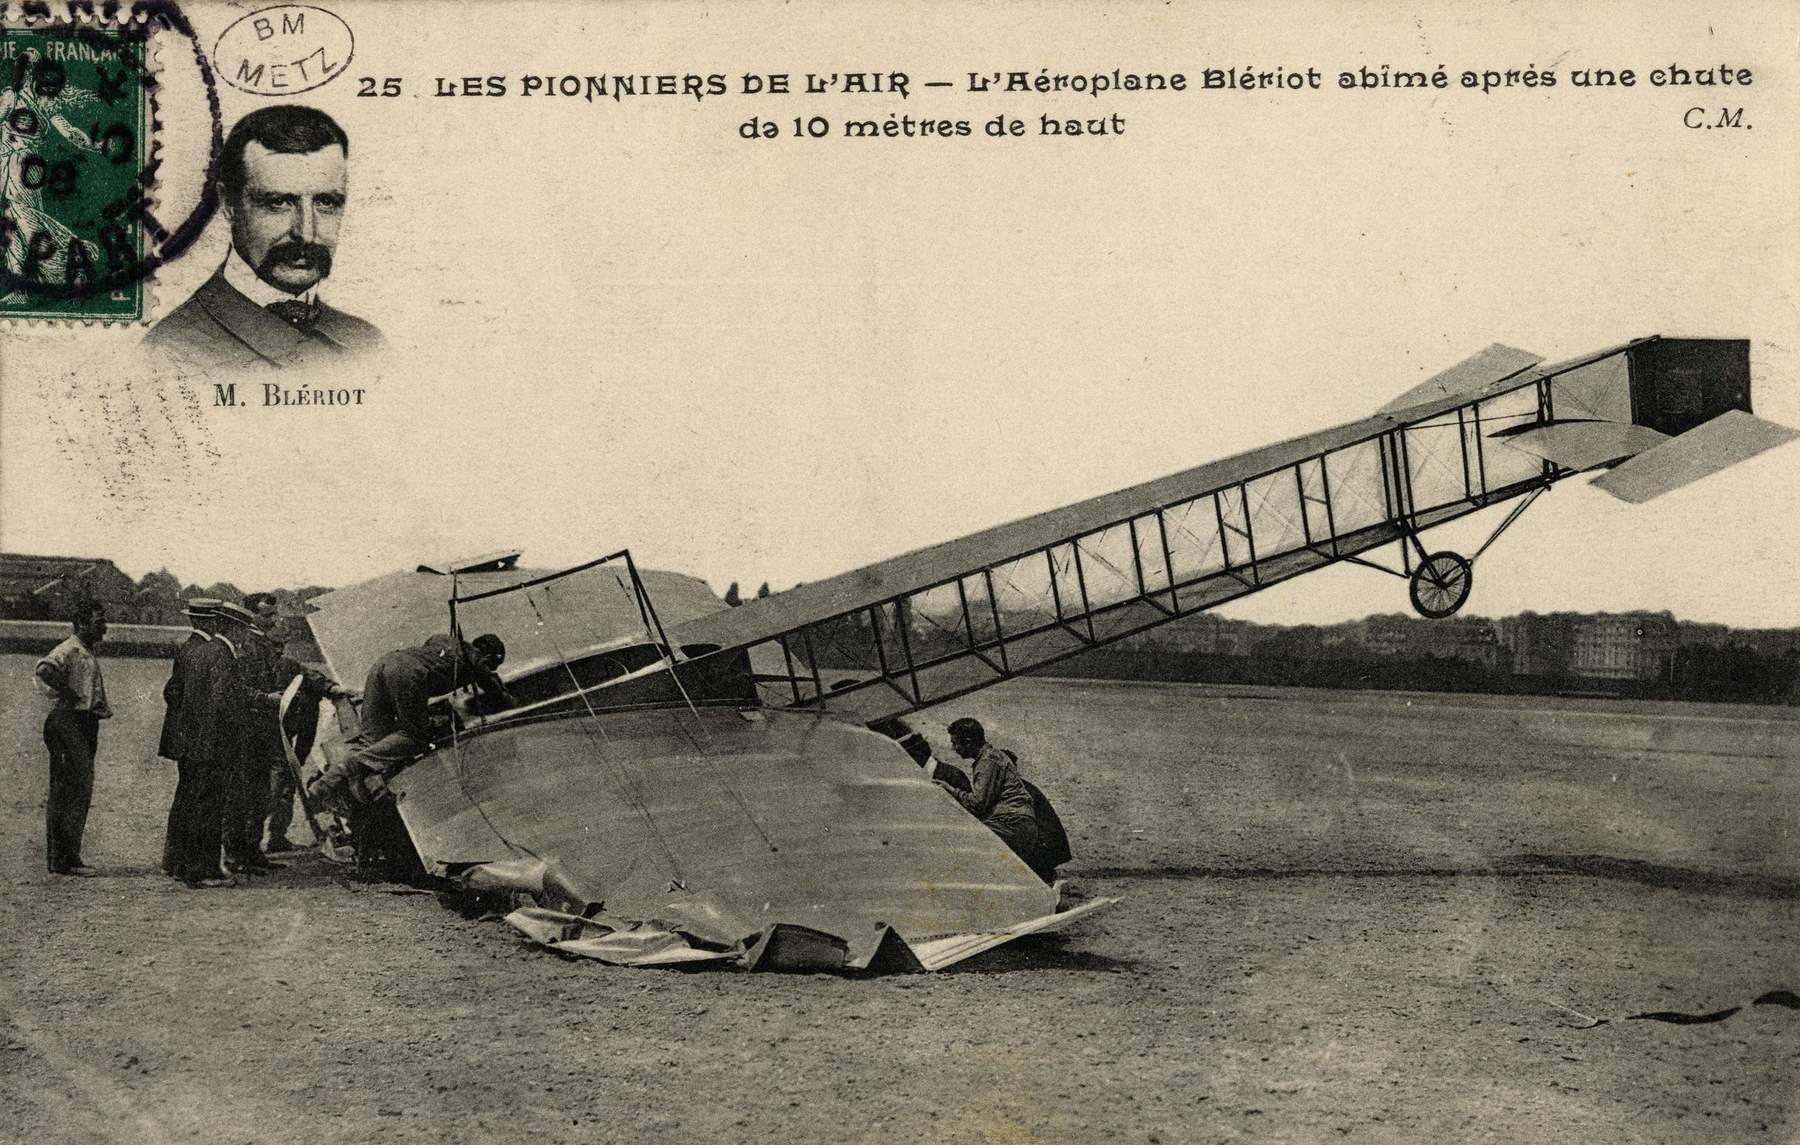 Contenu du Les pionniers de l'air